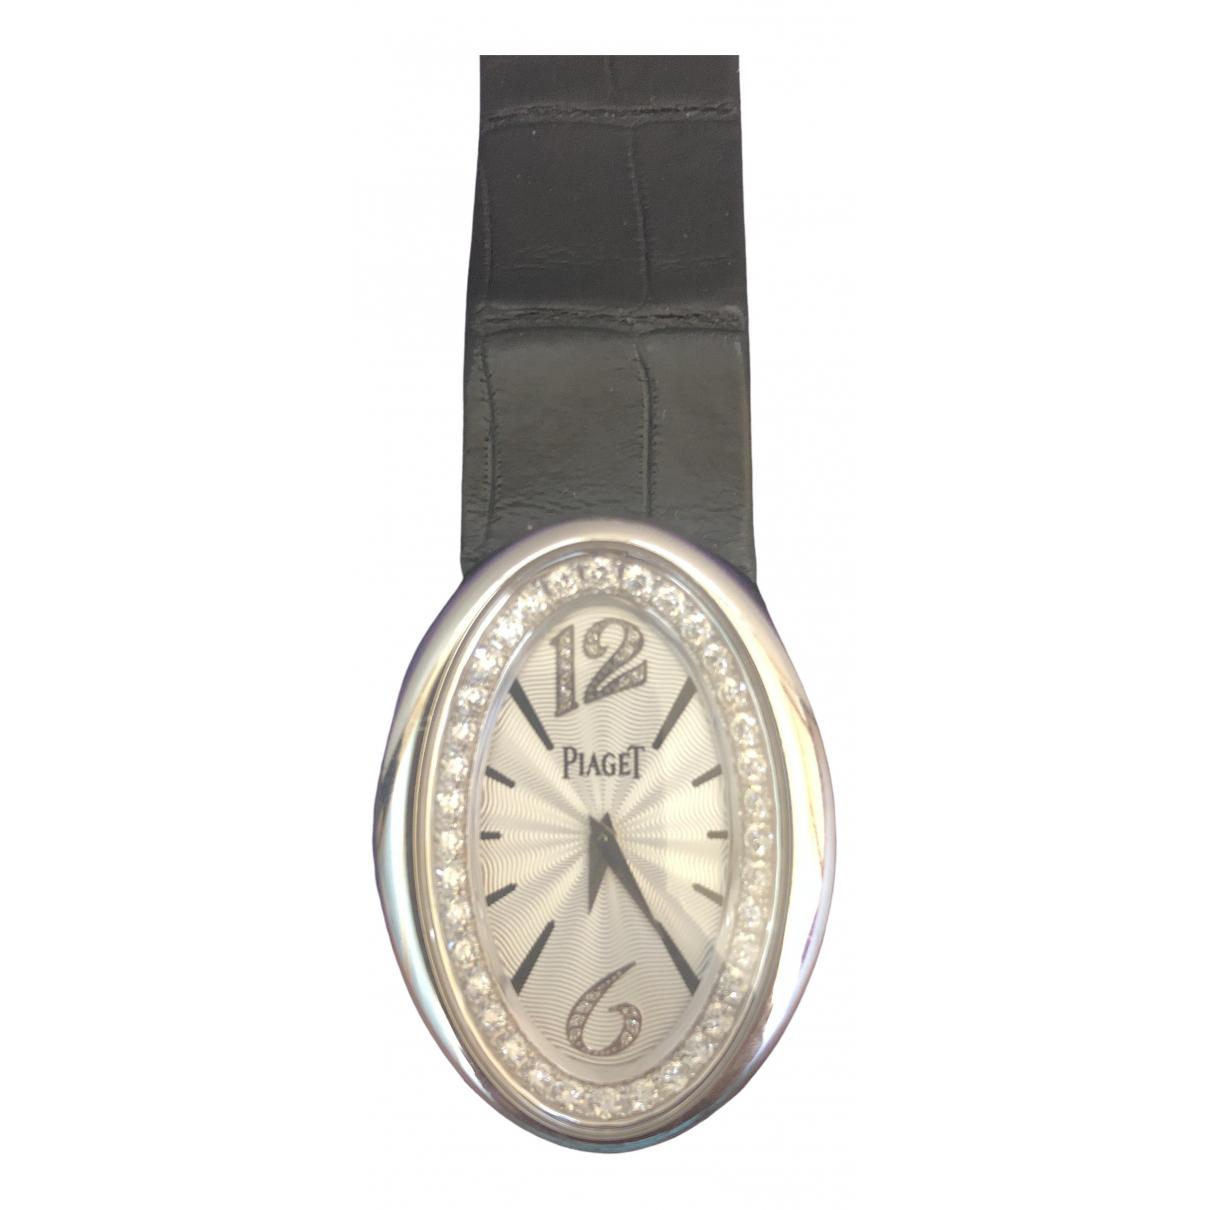 Piaget \N Black White gold watch for Women \N